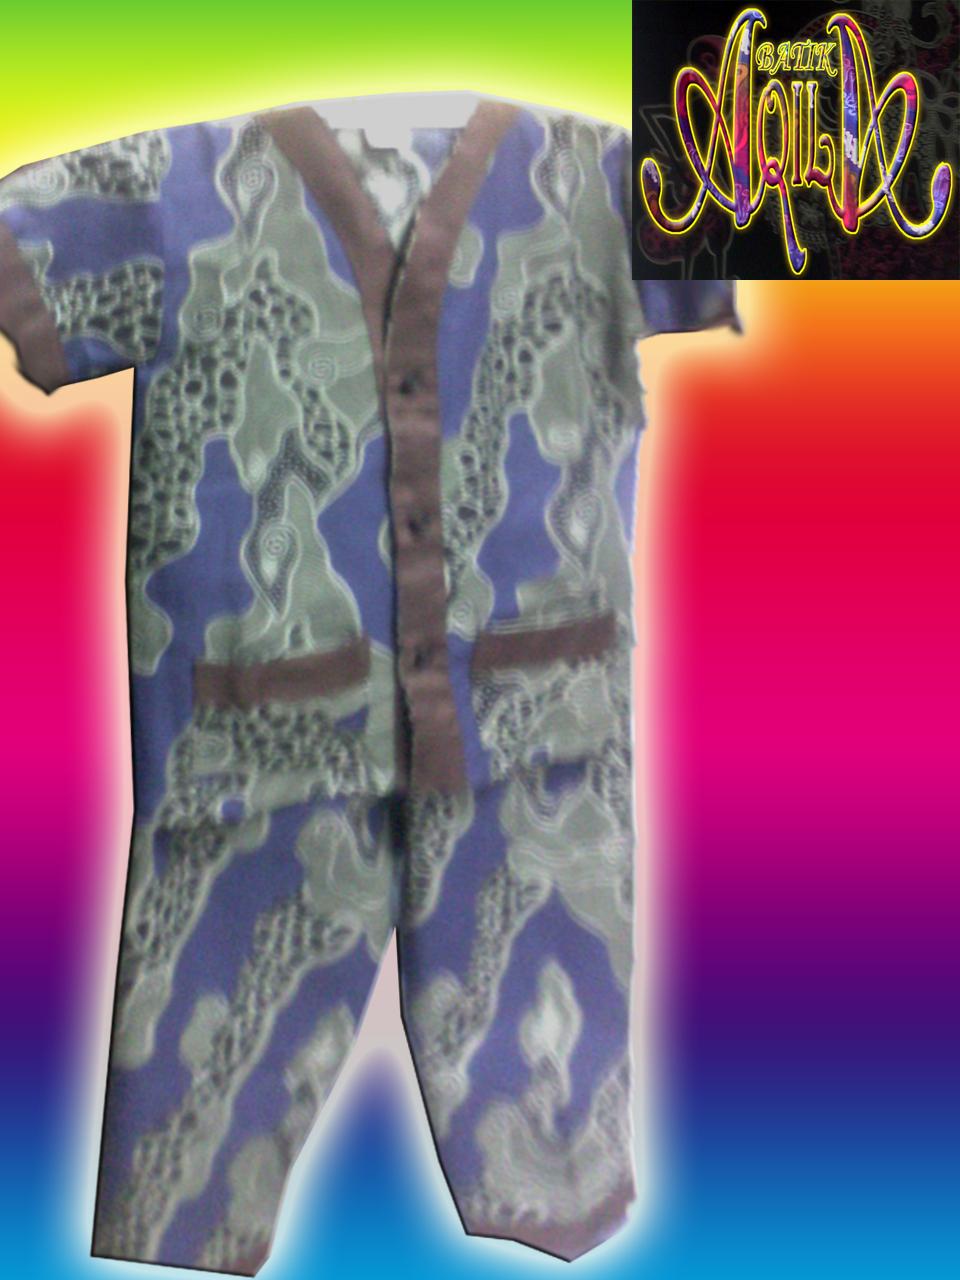 Grosir Baju Batik Anak, Batik Aqila baju Batik Anak terbuat dari bahan yang adem sejuk tidak panas dan di tambah dengan berbagai kotif batik yang tentunya disukai anak-anak. SPECIAL PRICE !!!: 1 pcs = Rp. 25.000 3 pcs = Rp. 69.000 (HEMAT 6.000) 5 pcs = Rp. 110.000 (HEMAT 14.000) 9 pcs = Rp. 189.000 (HEMAT 36.000) 10 pcs = Rp. 200.000 (HEMAT 50.000) jika anda berminat silahkan hubungi kami di 0852329133113 (telkomsel) DAPATKAN DISKON MENARIK LAINNYA DENGAN MENGHUBUNGI KAMI LANGSUNG!!! http://batikaqila.blogspot.com